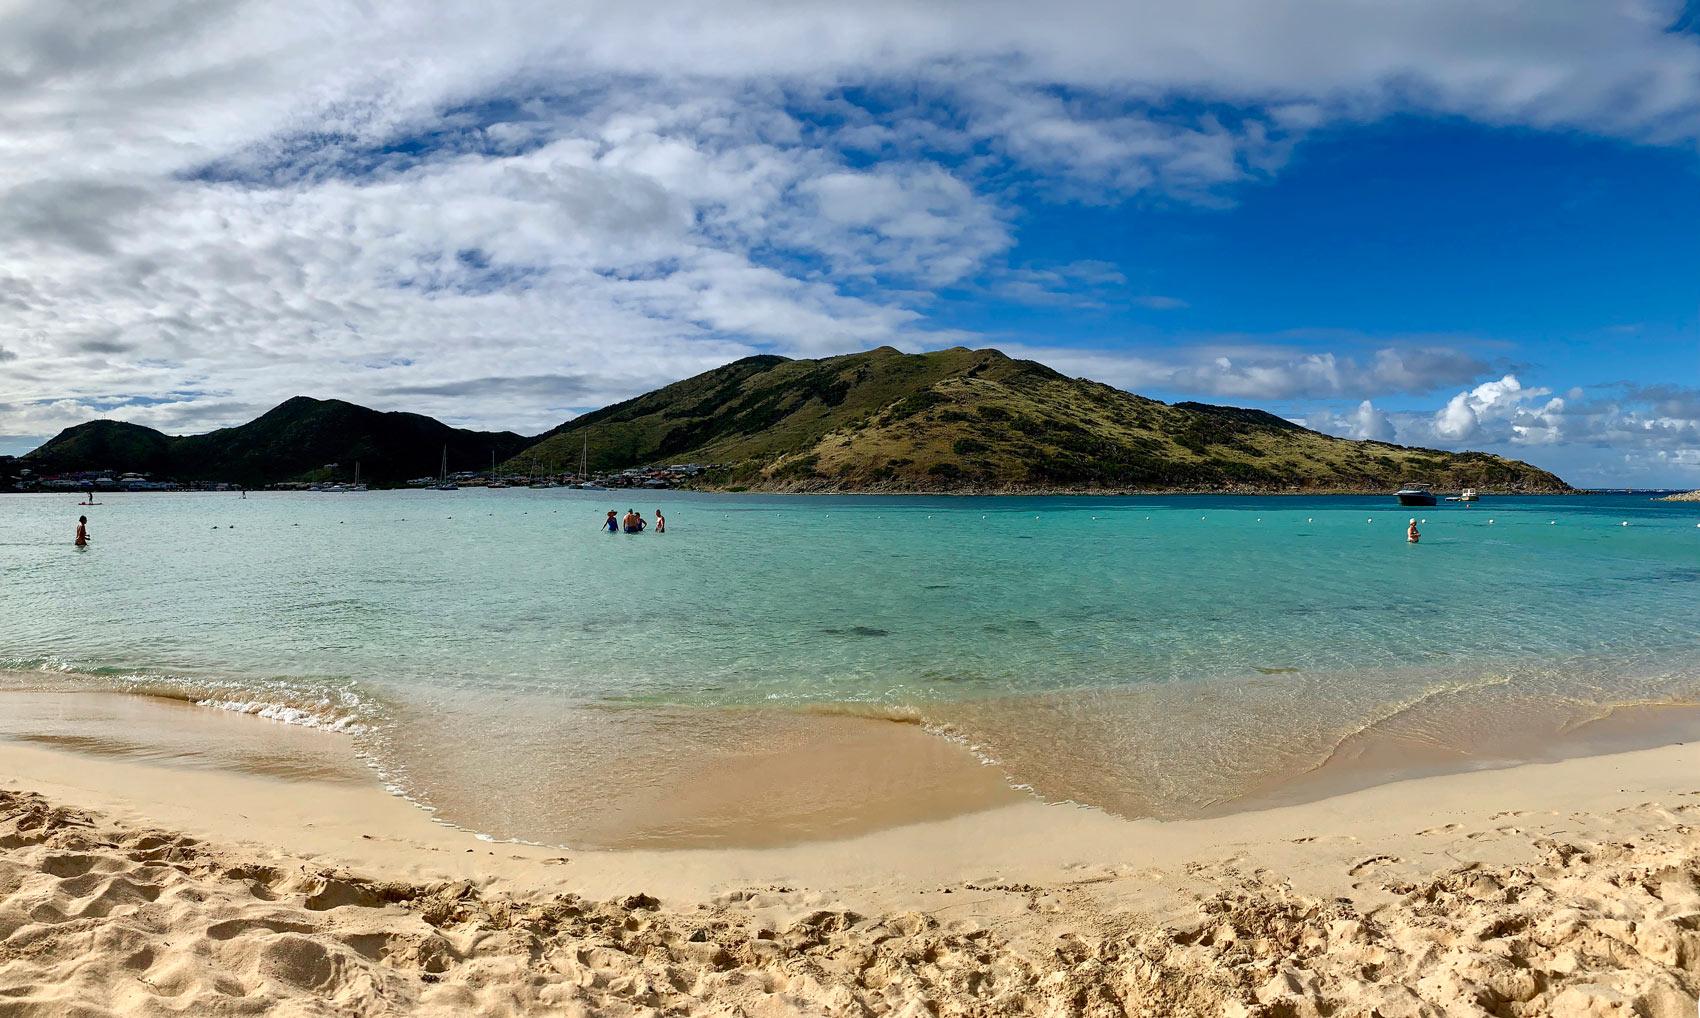 Saint-Martin-Pinel-Island-beach-Panorama.jpg